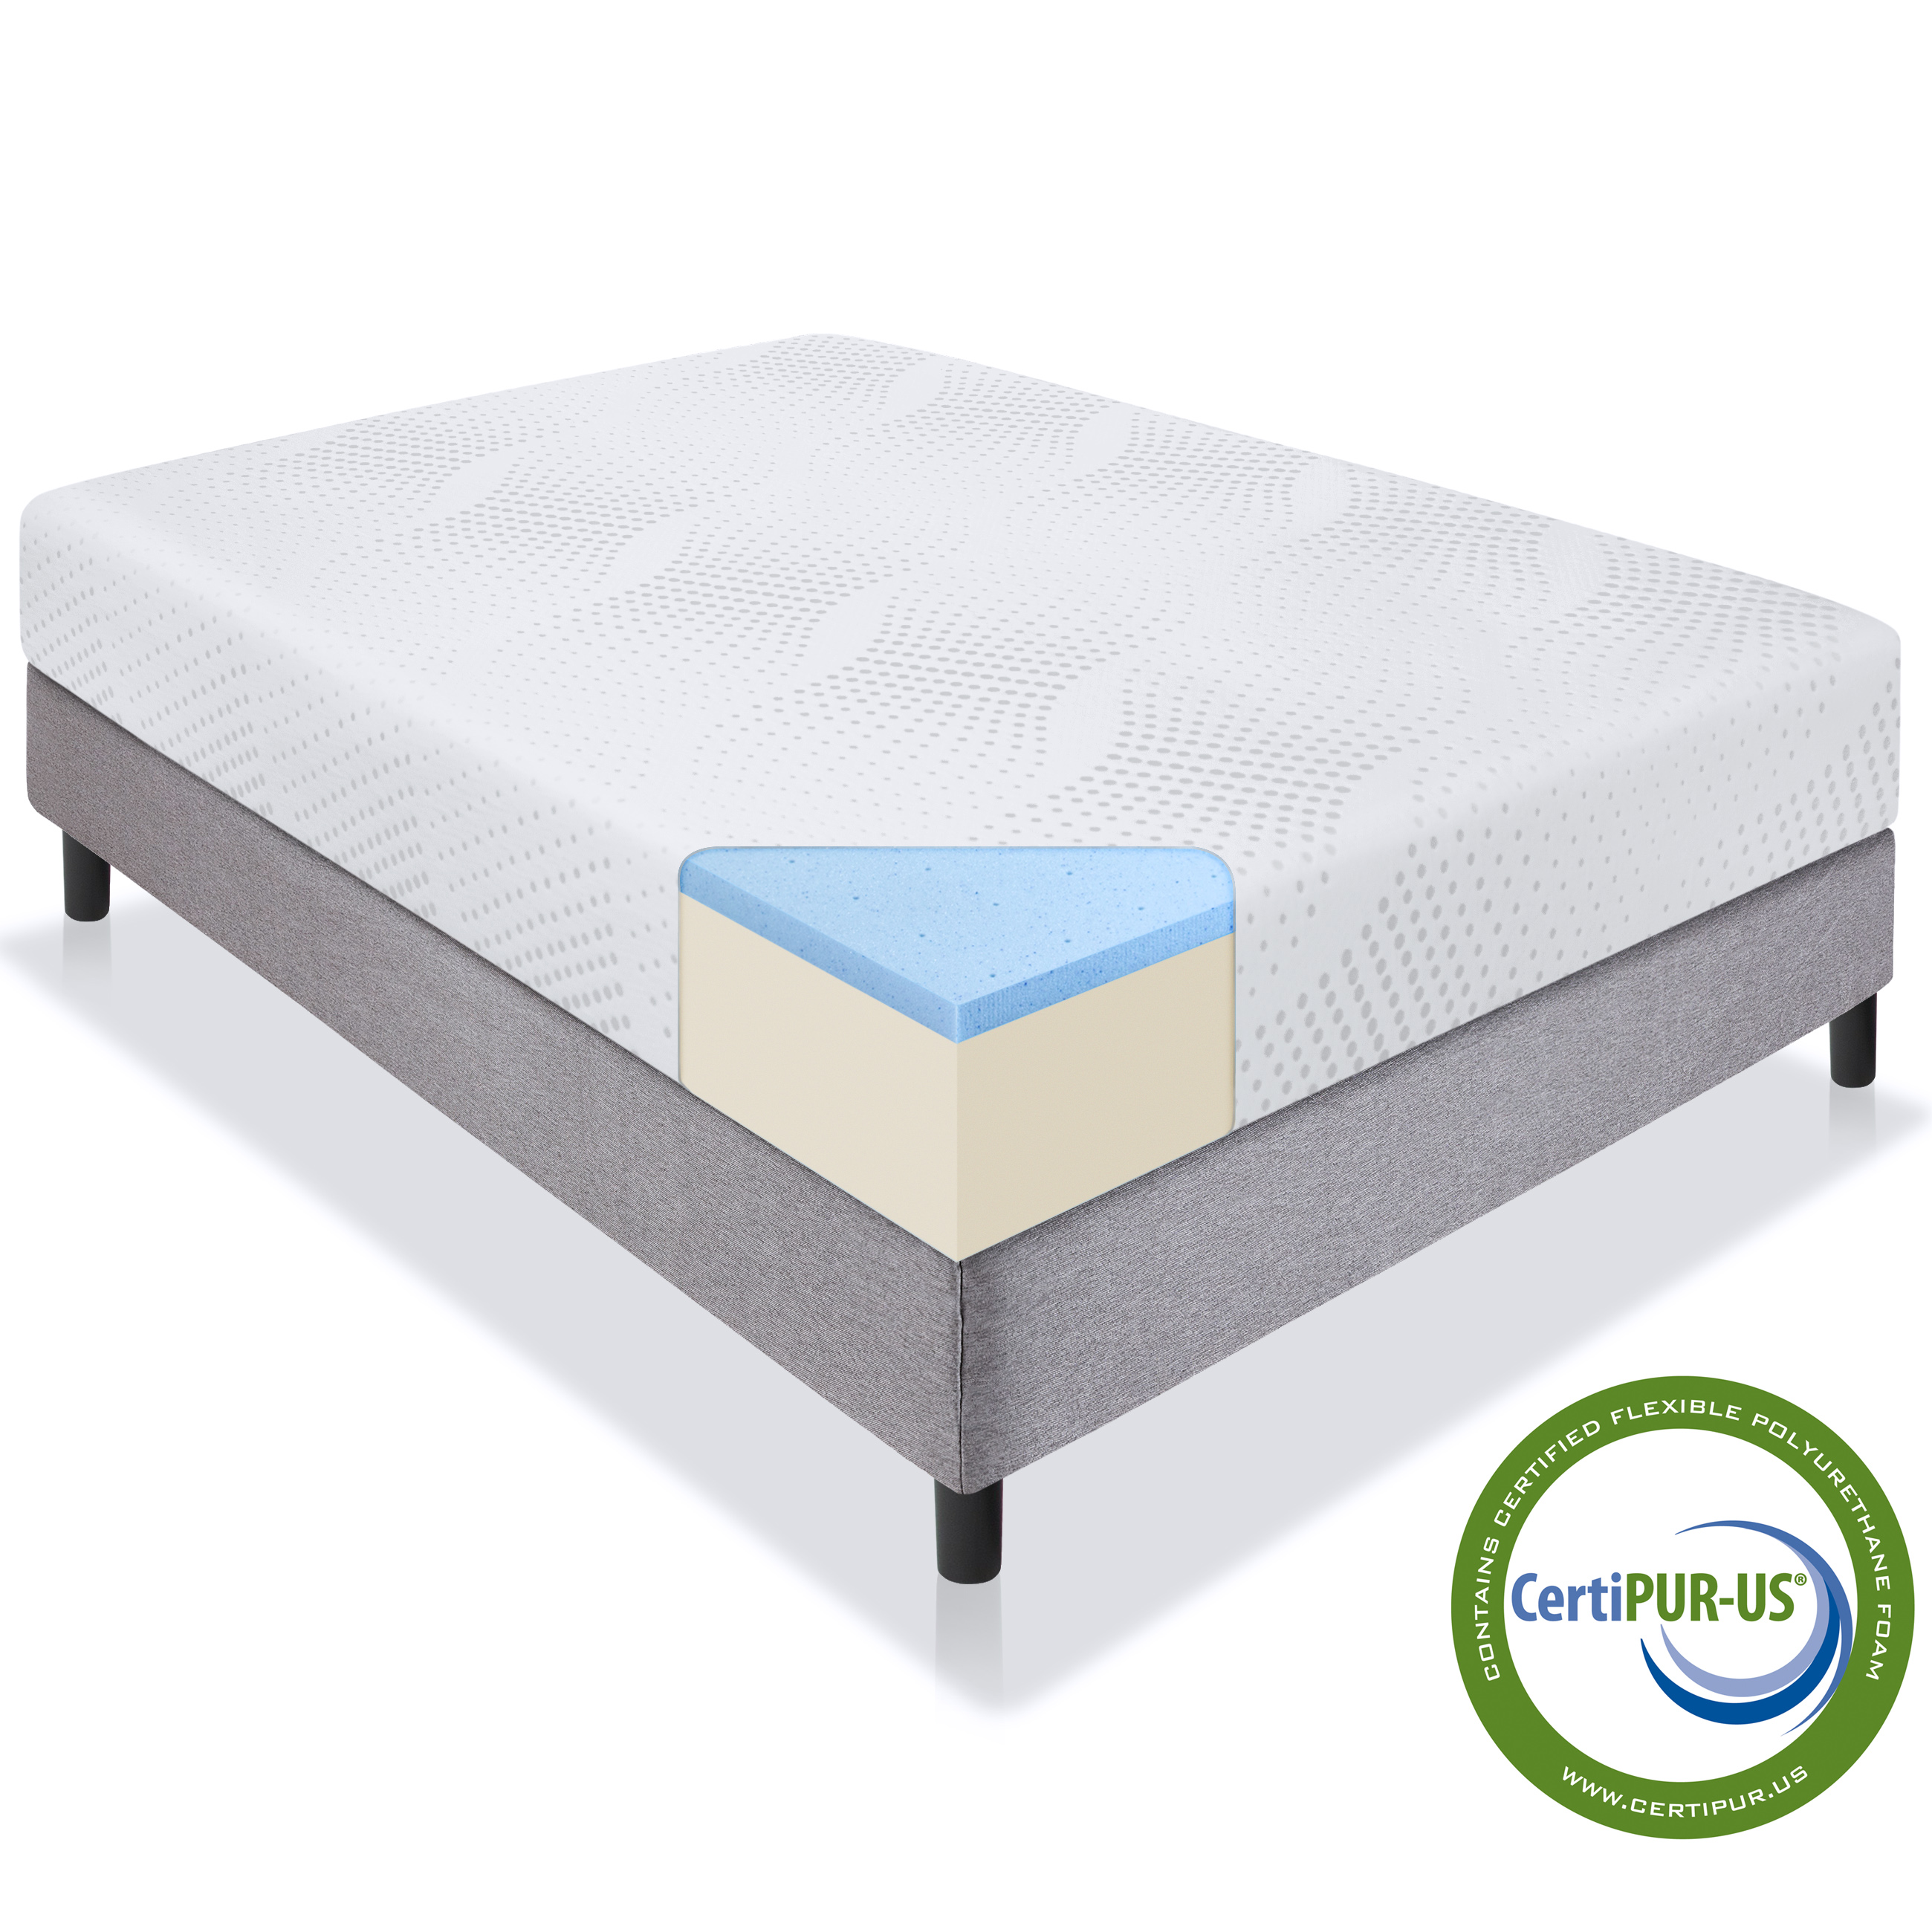 Best Choice Products 10in Queen Size Dual Layered Gel Memory Foam Mattress w/ CertiPUR-US Certified Foam